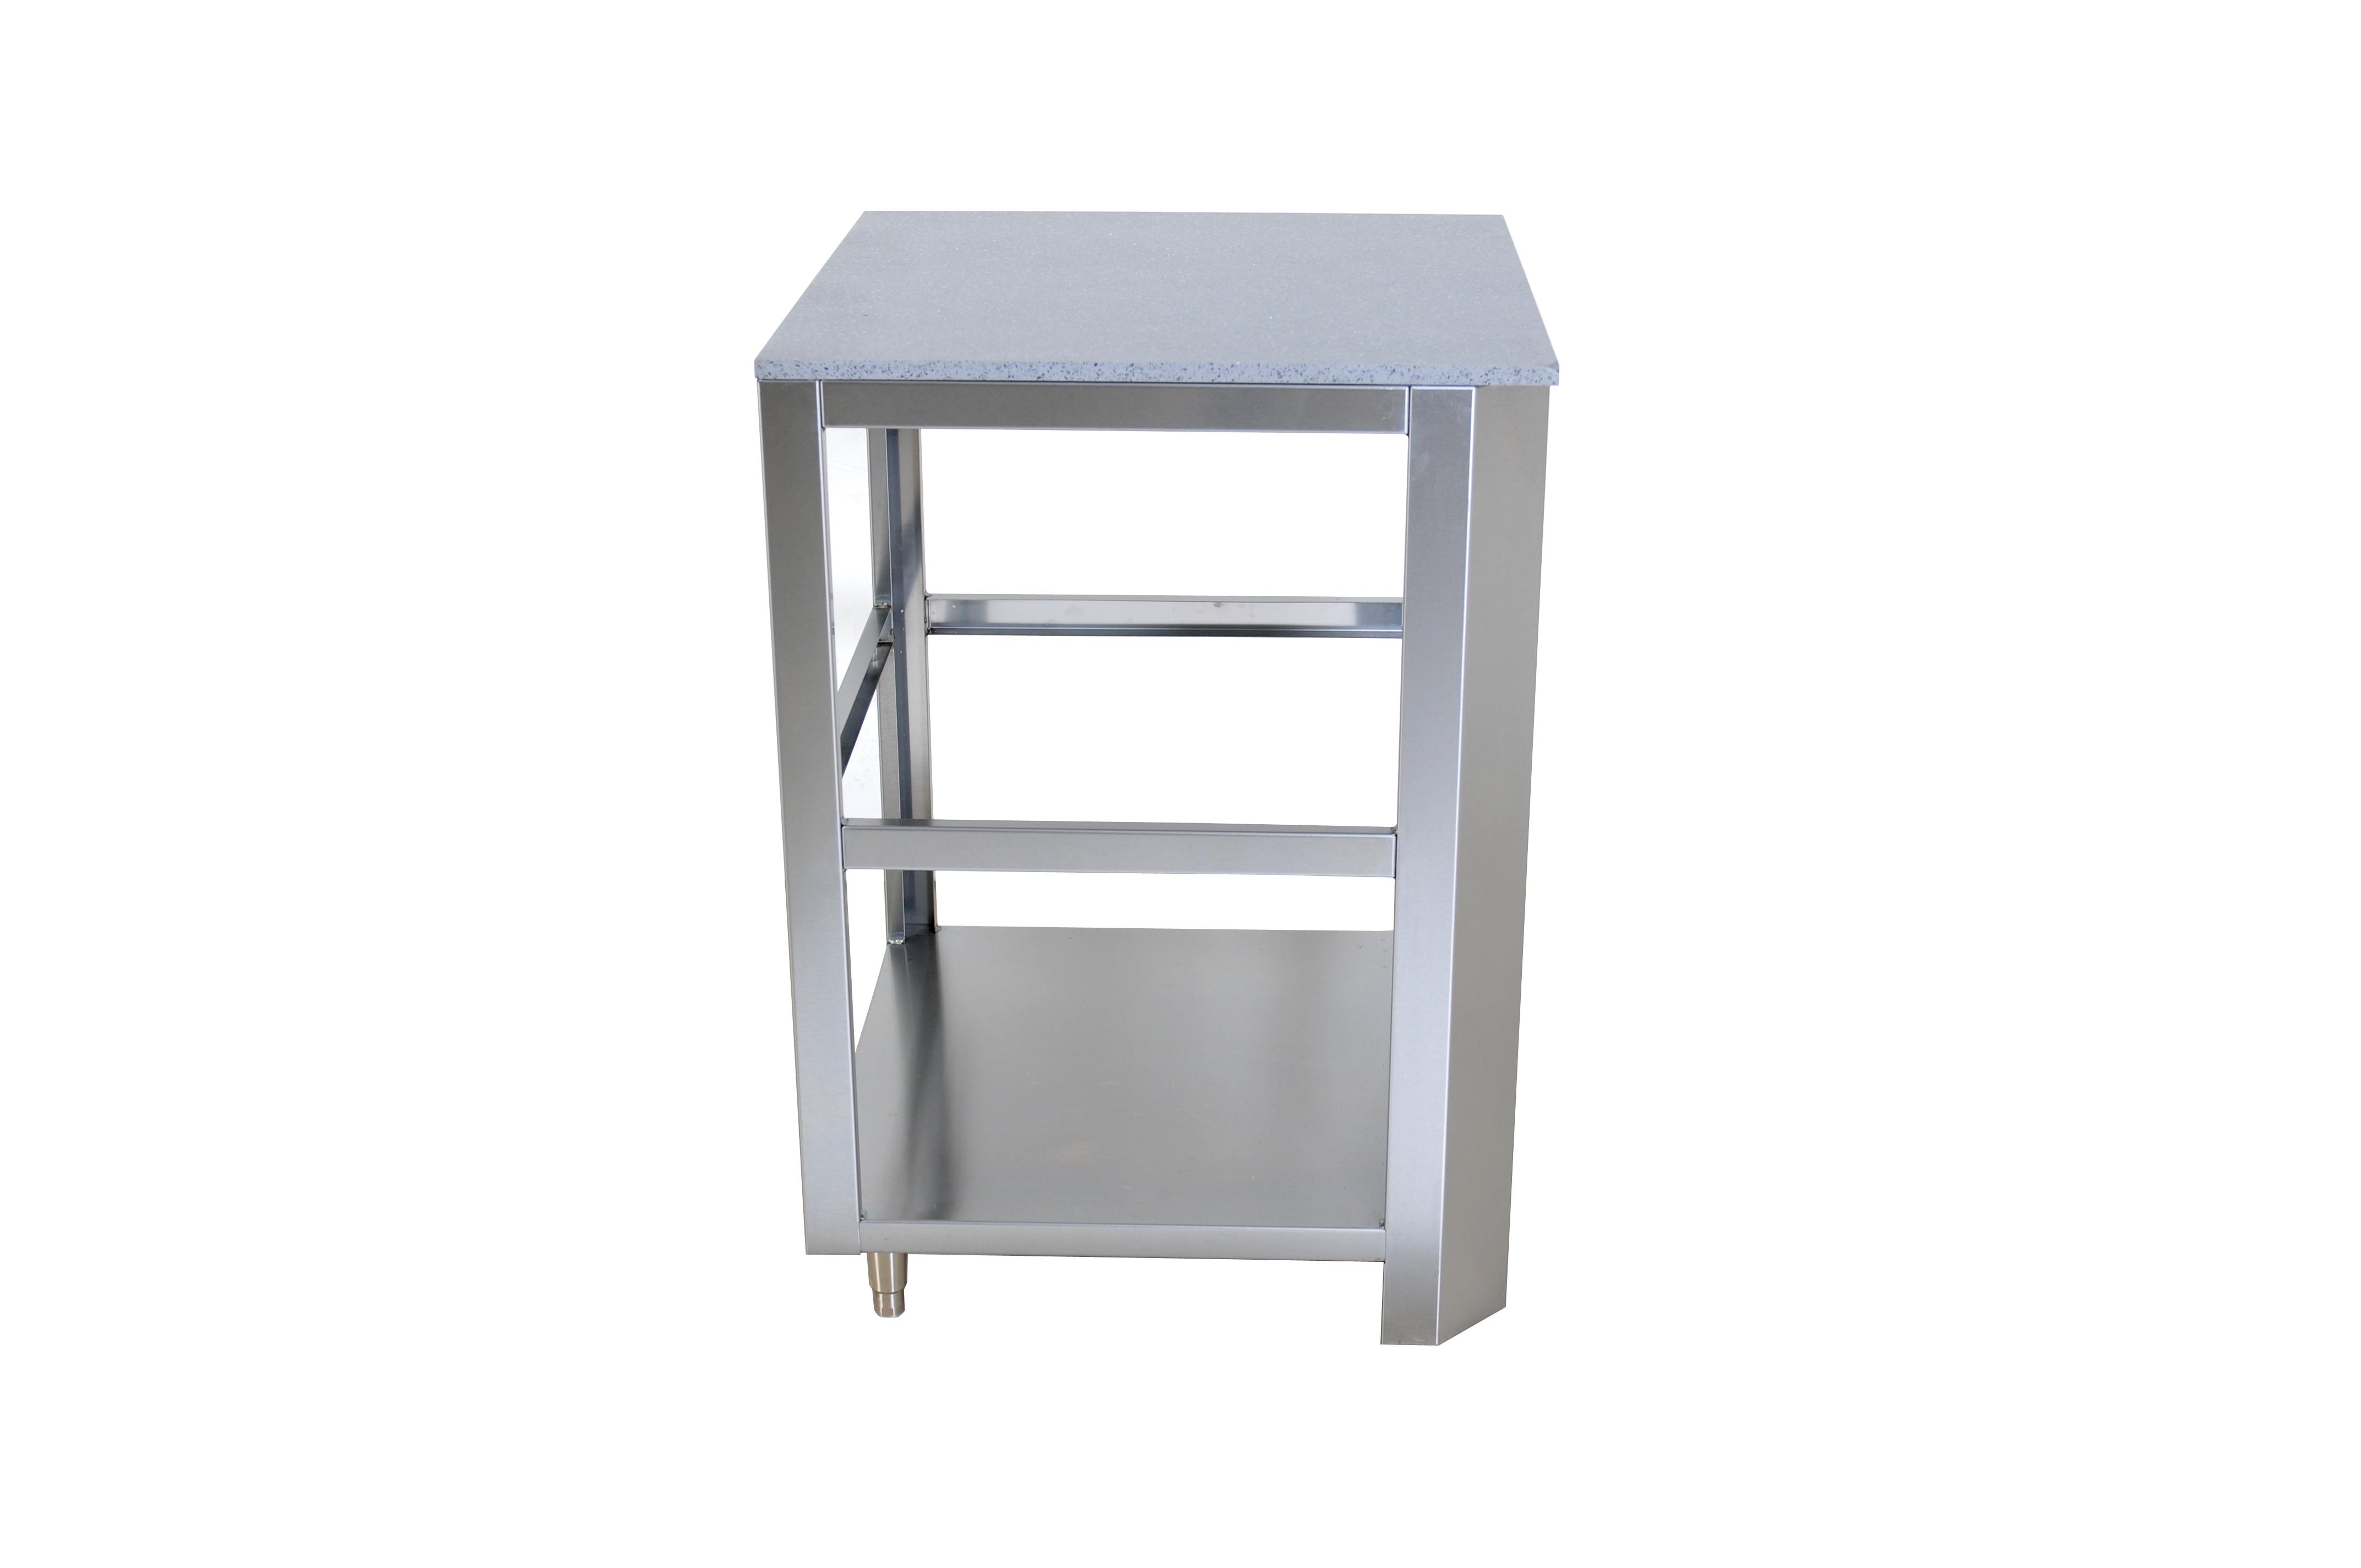 Outdoor kitchen module square corner unit grandfire bbq for Outdoor kuchen module